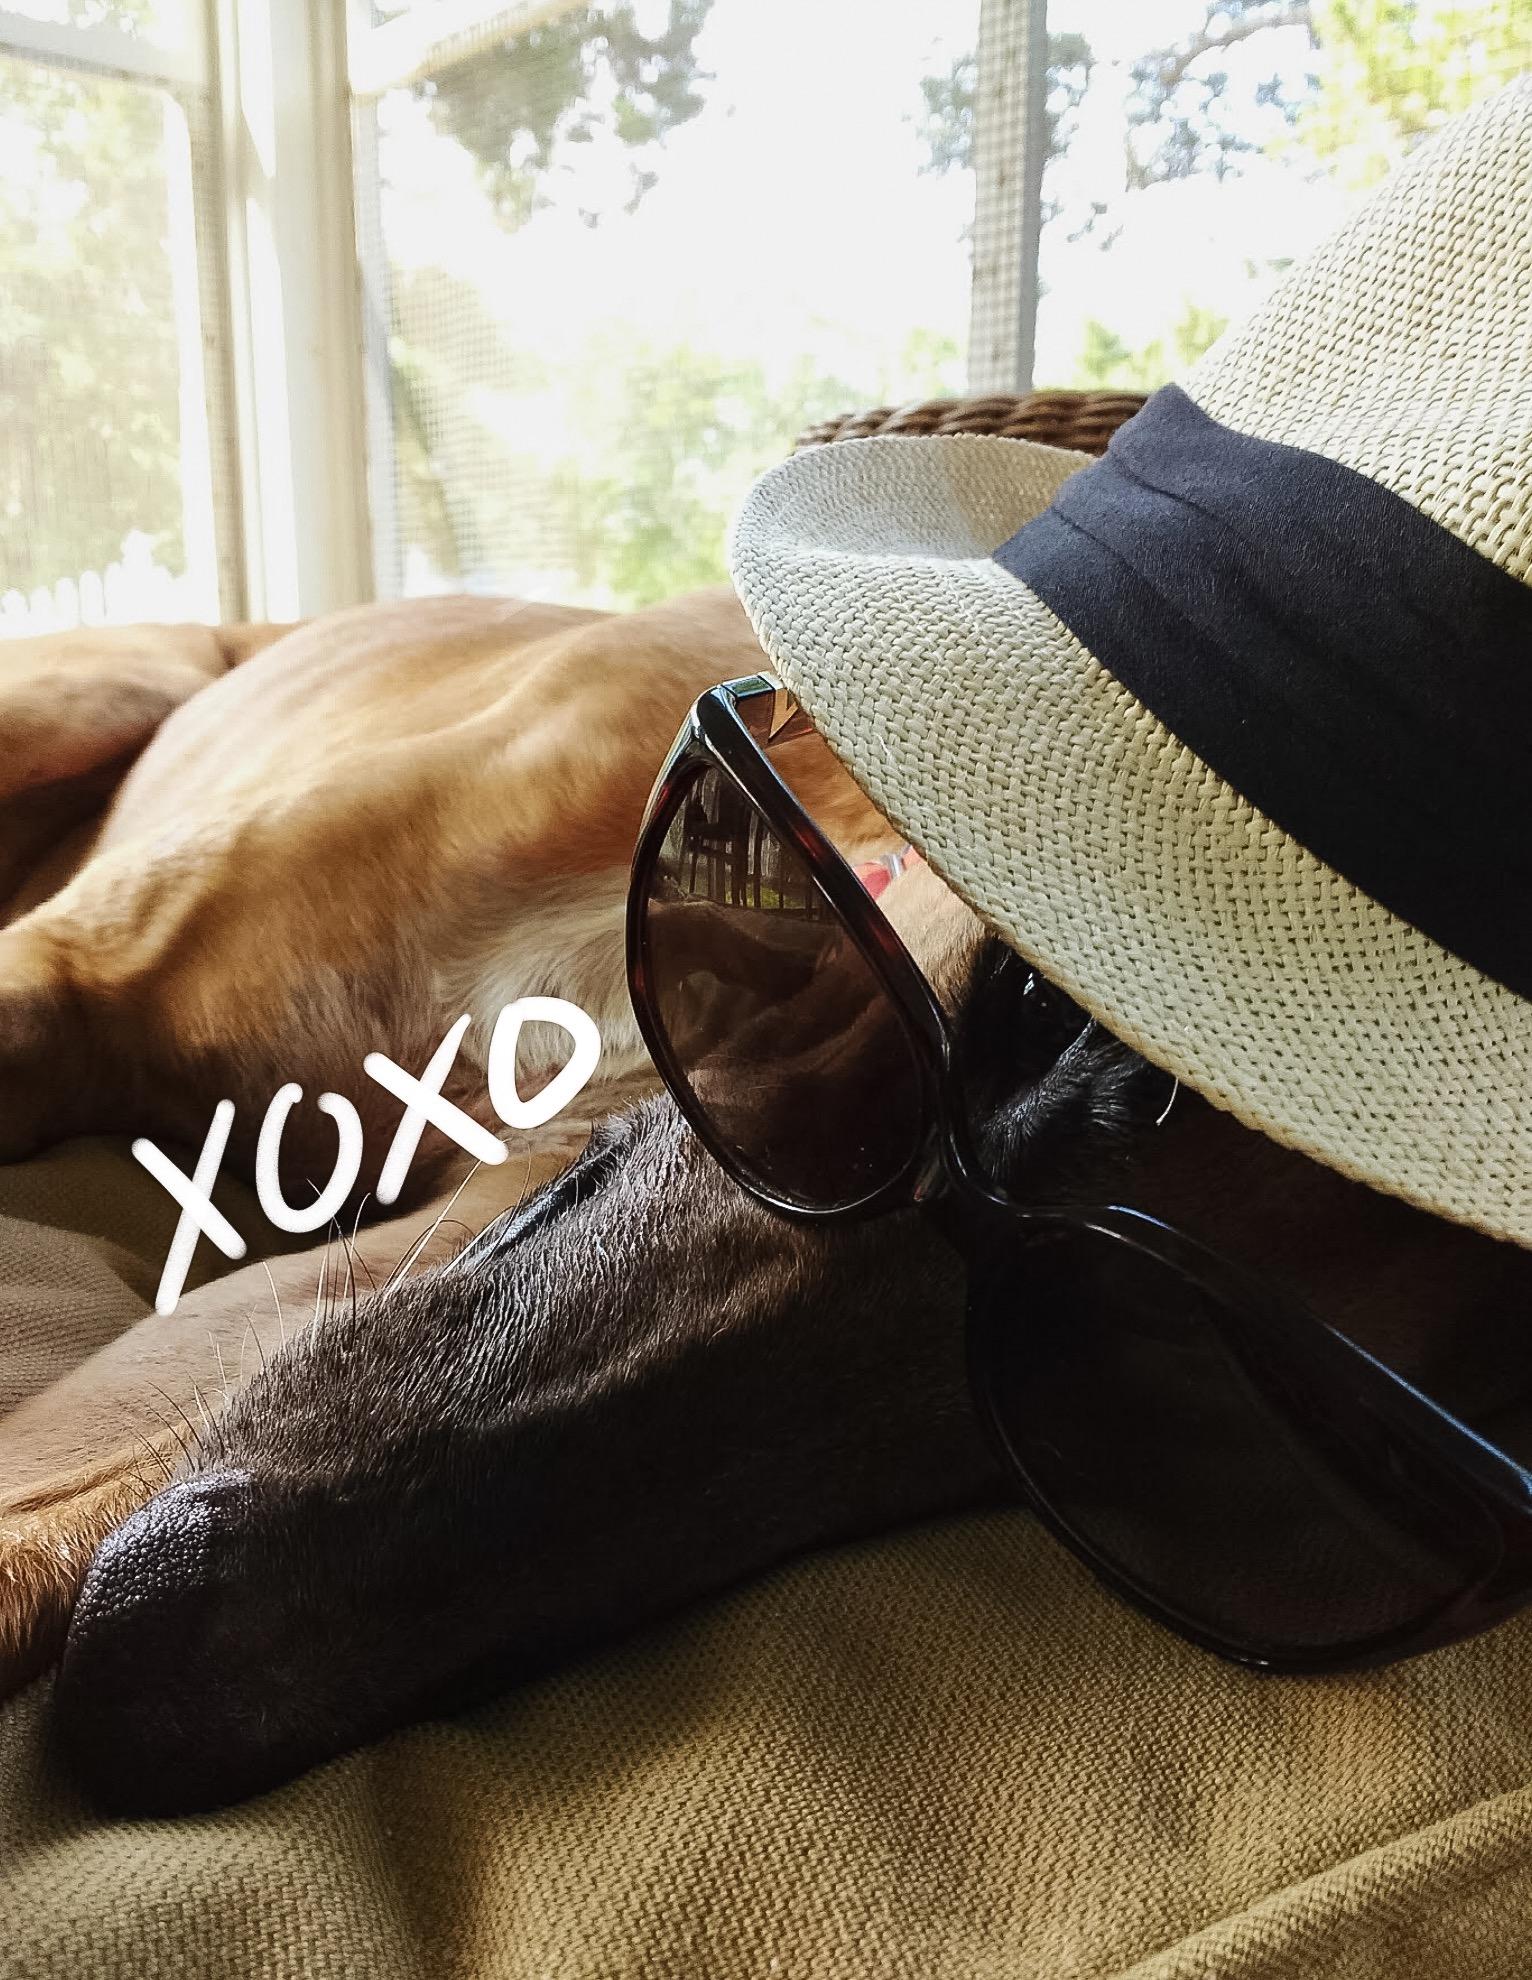 Summer, sunglasses, and booze hound.